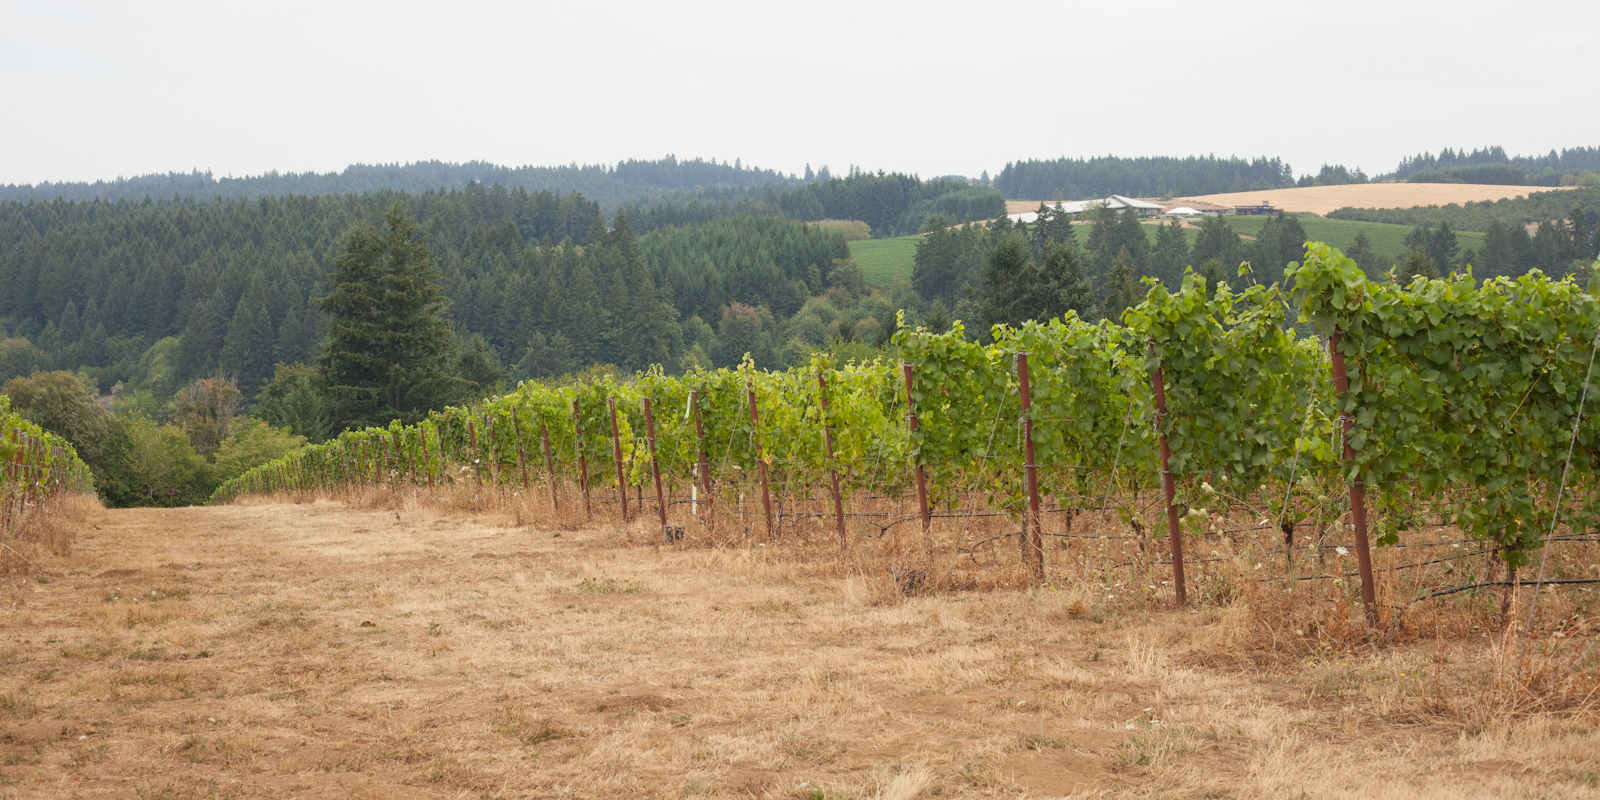 Vineyards at Raptor Ridge Winery, Chehalem Mountains AVA, Oregon